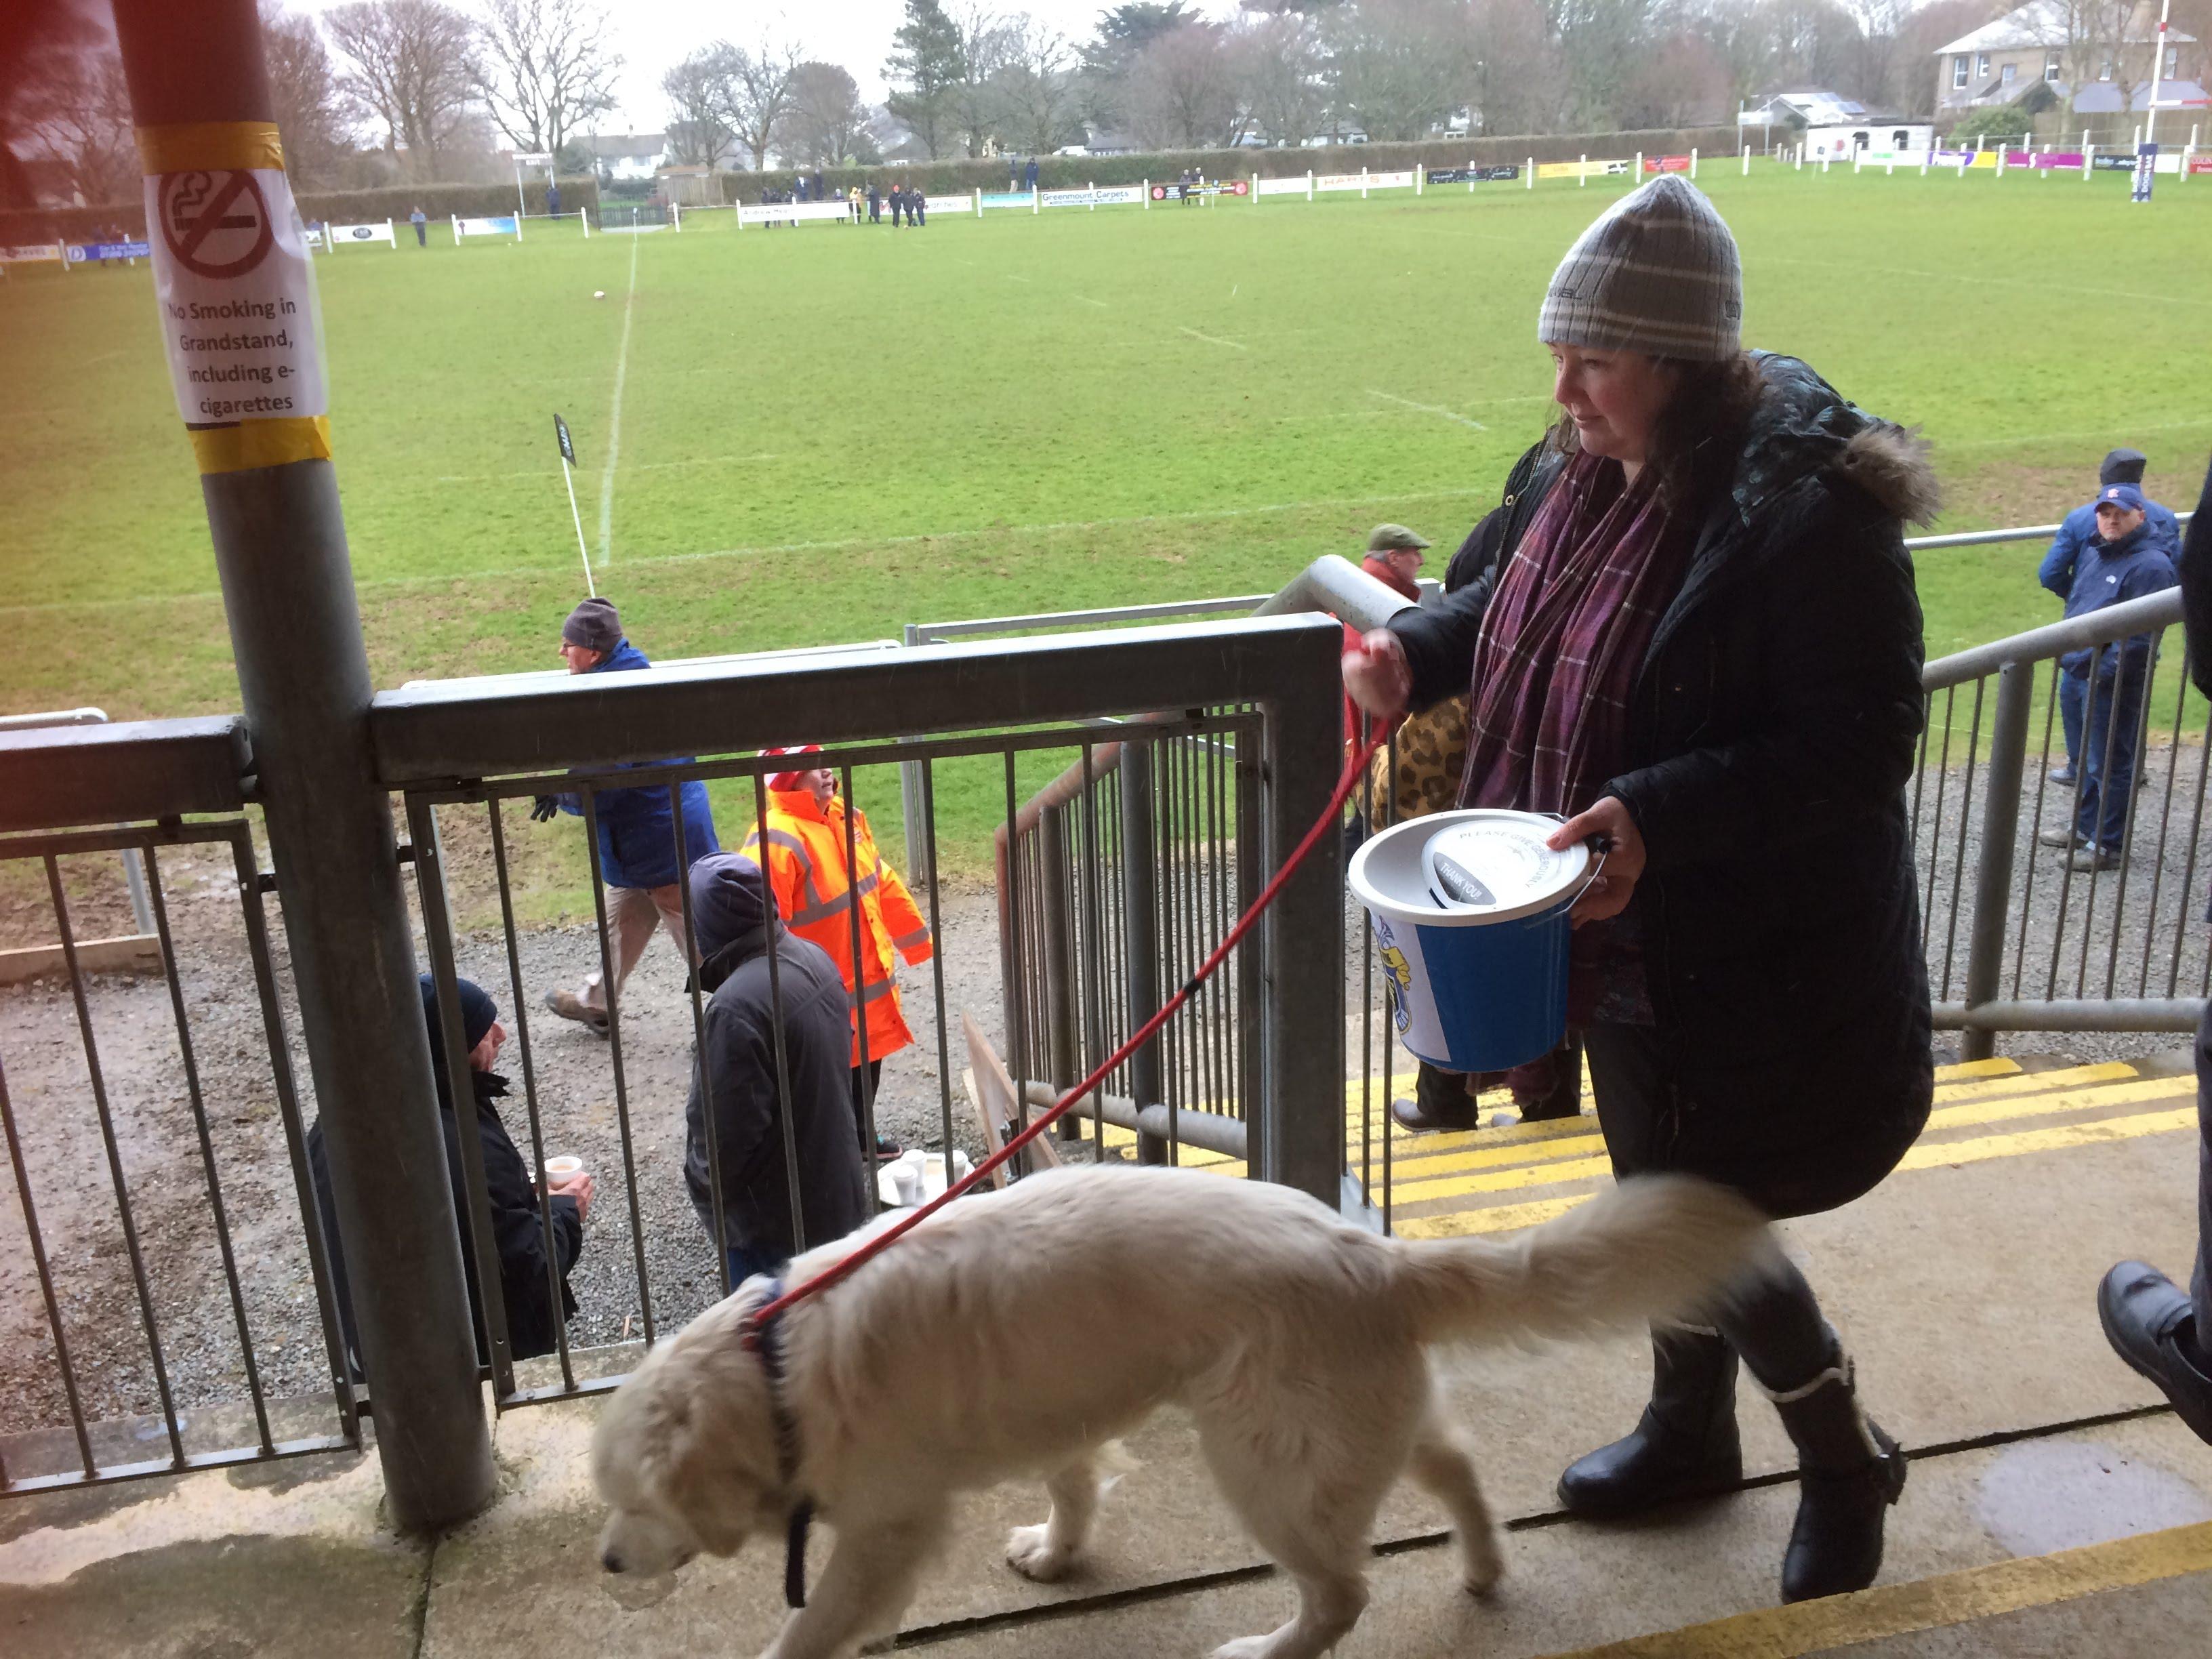 Camborne Rugby Club